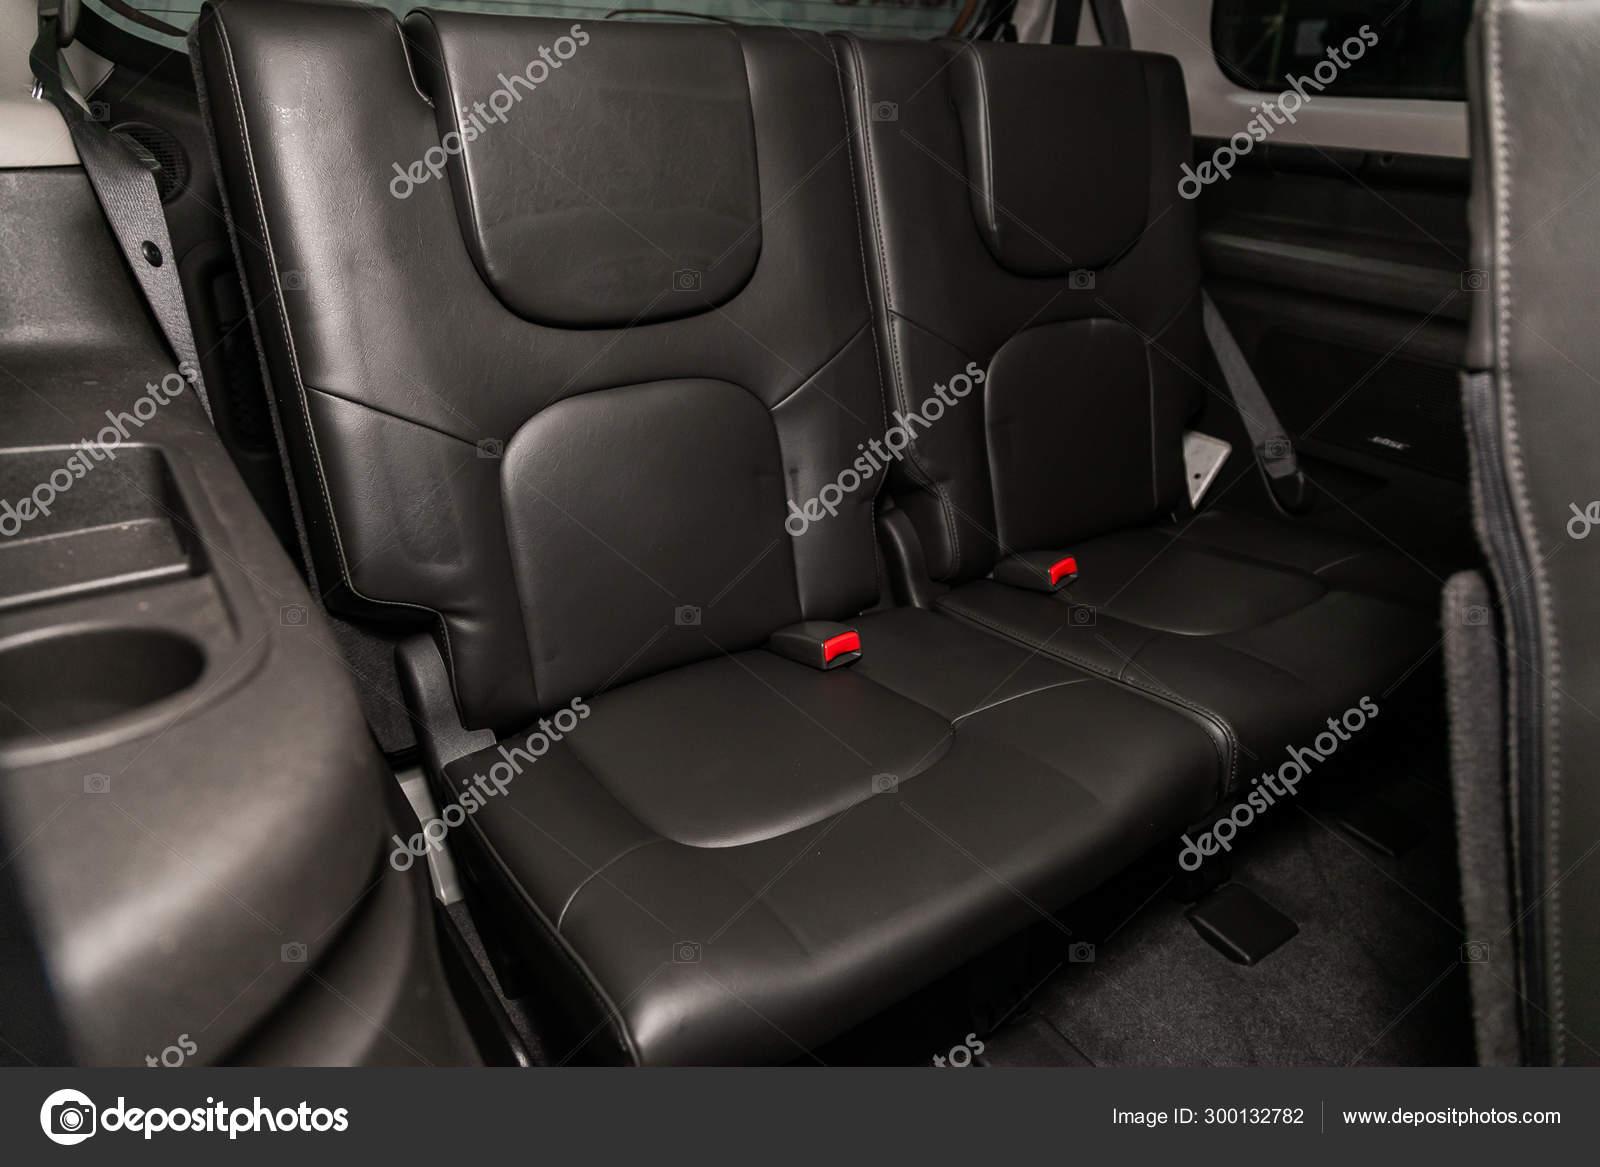 Novosibirsk Russia Agosto 2019 Nissan Pathfinder Design Interiores Couro Preto Fotografia De Stock Editorial C Everyonensk 300132782